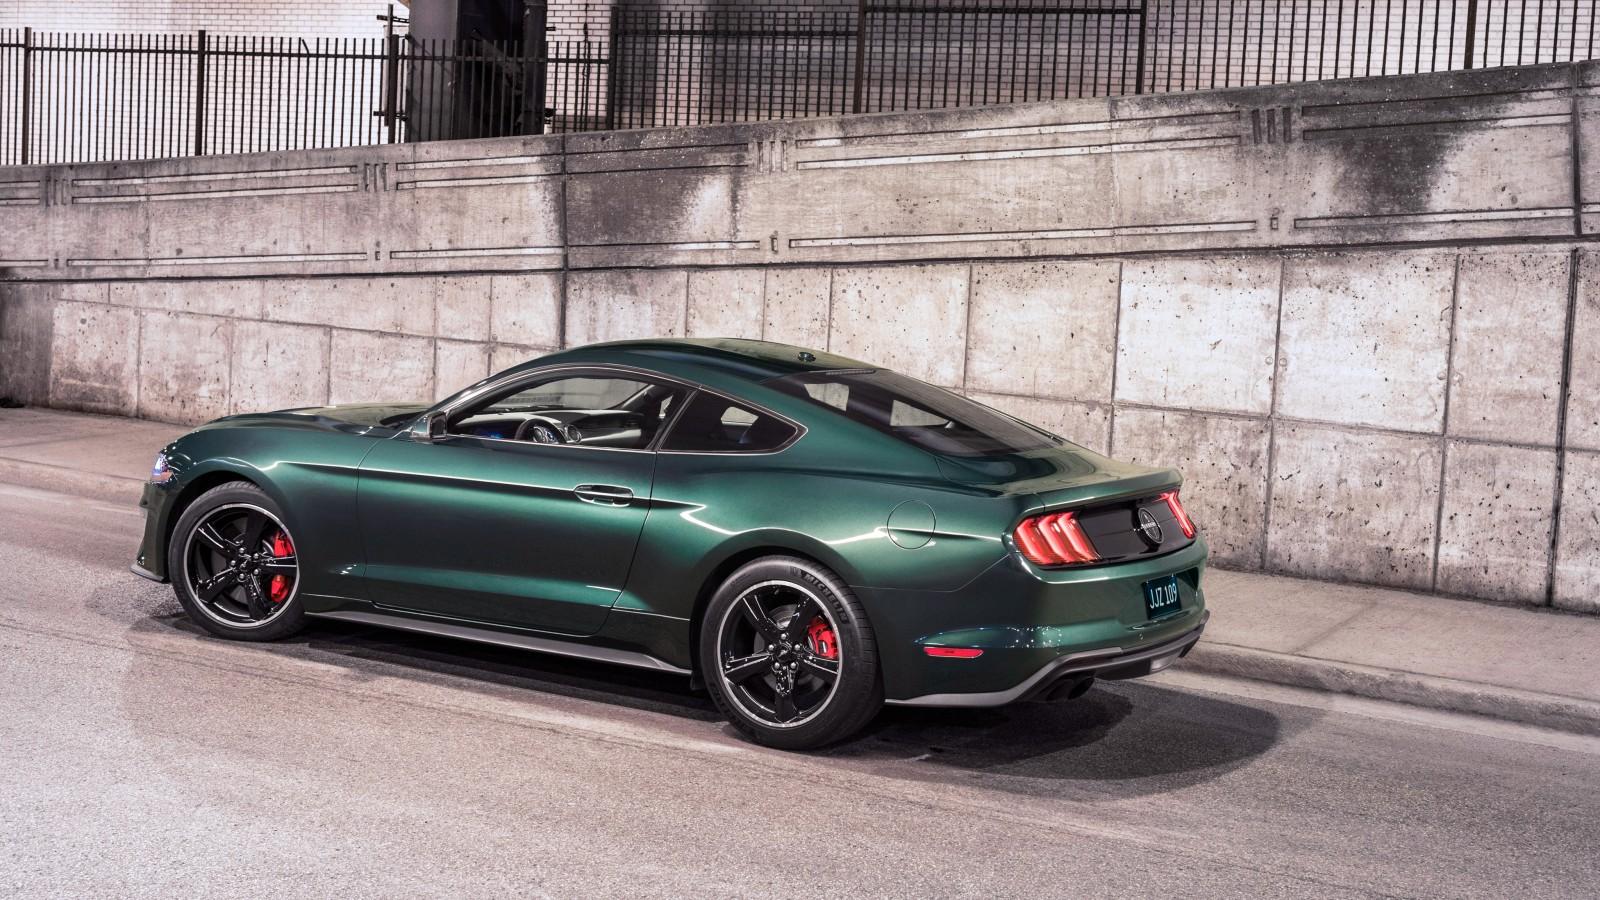 2019 Ford Mustang Bullitt 4k Wallpaper Hd Car Wallpapers